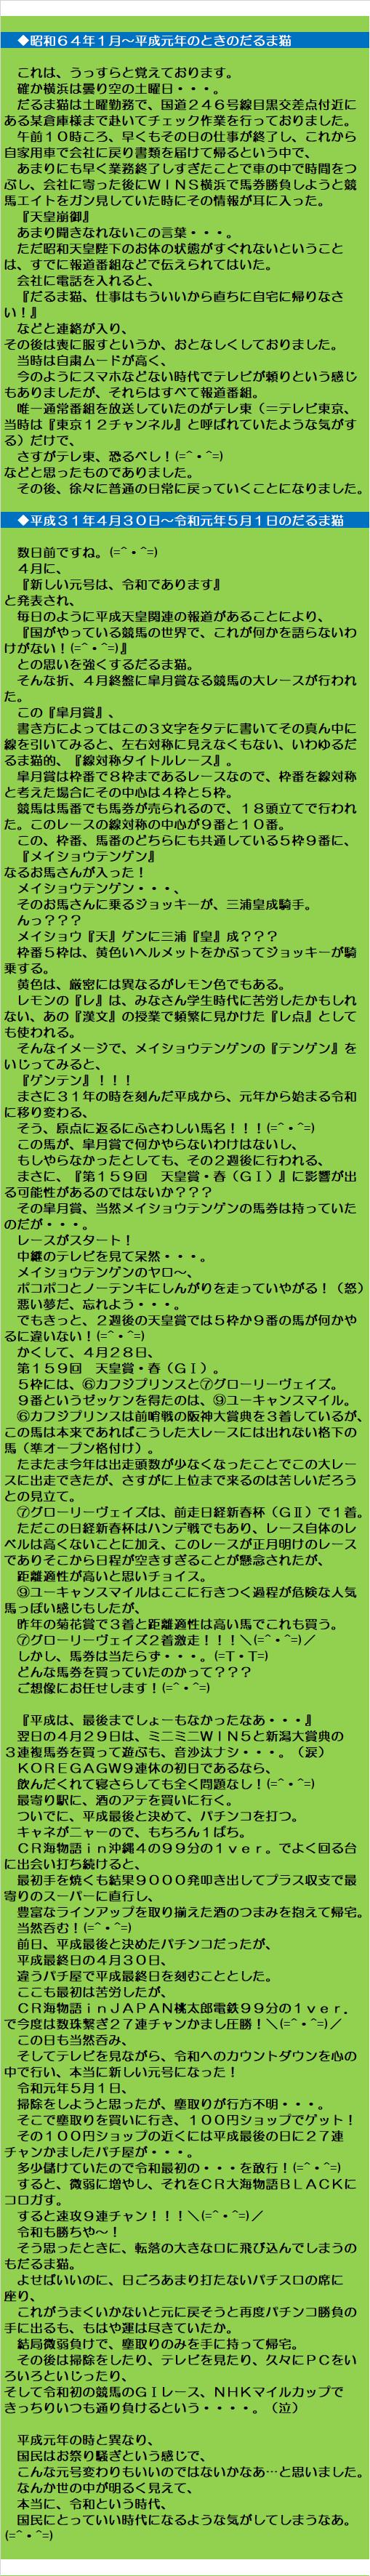 20190505・祝!令和元年!!!\(=^・^=)/②.png